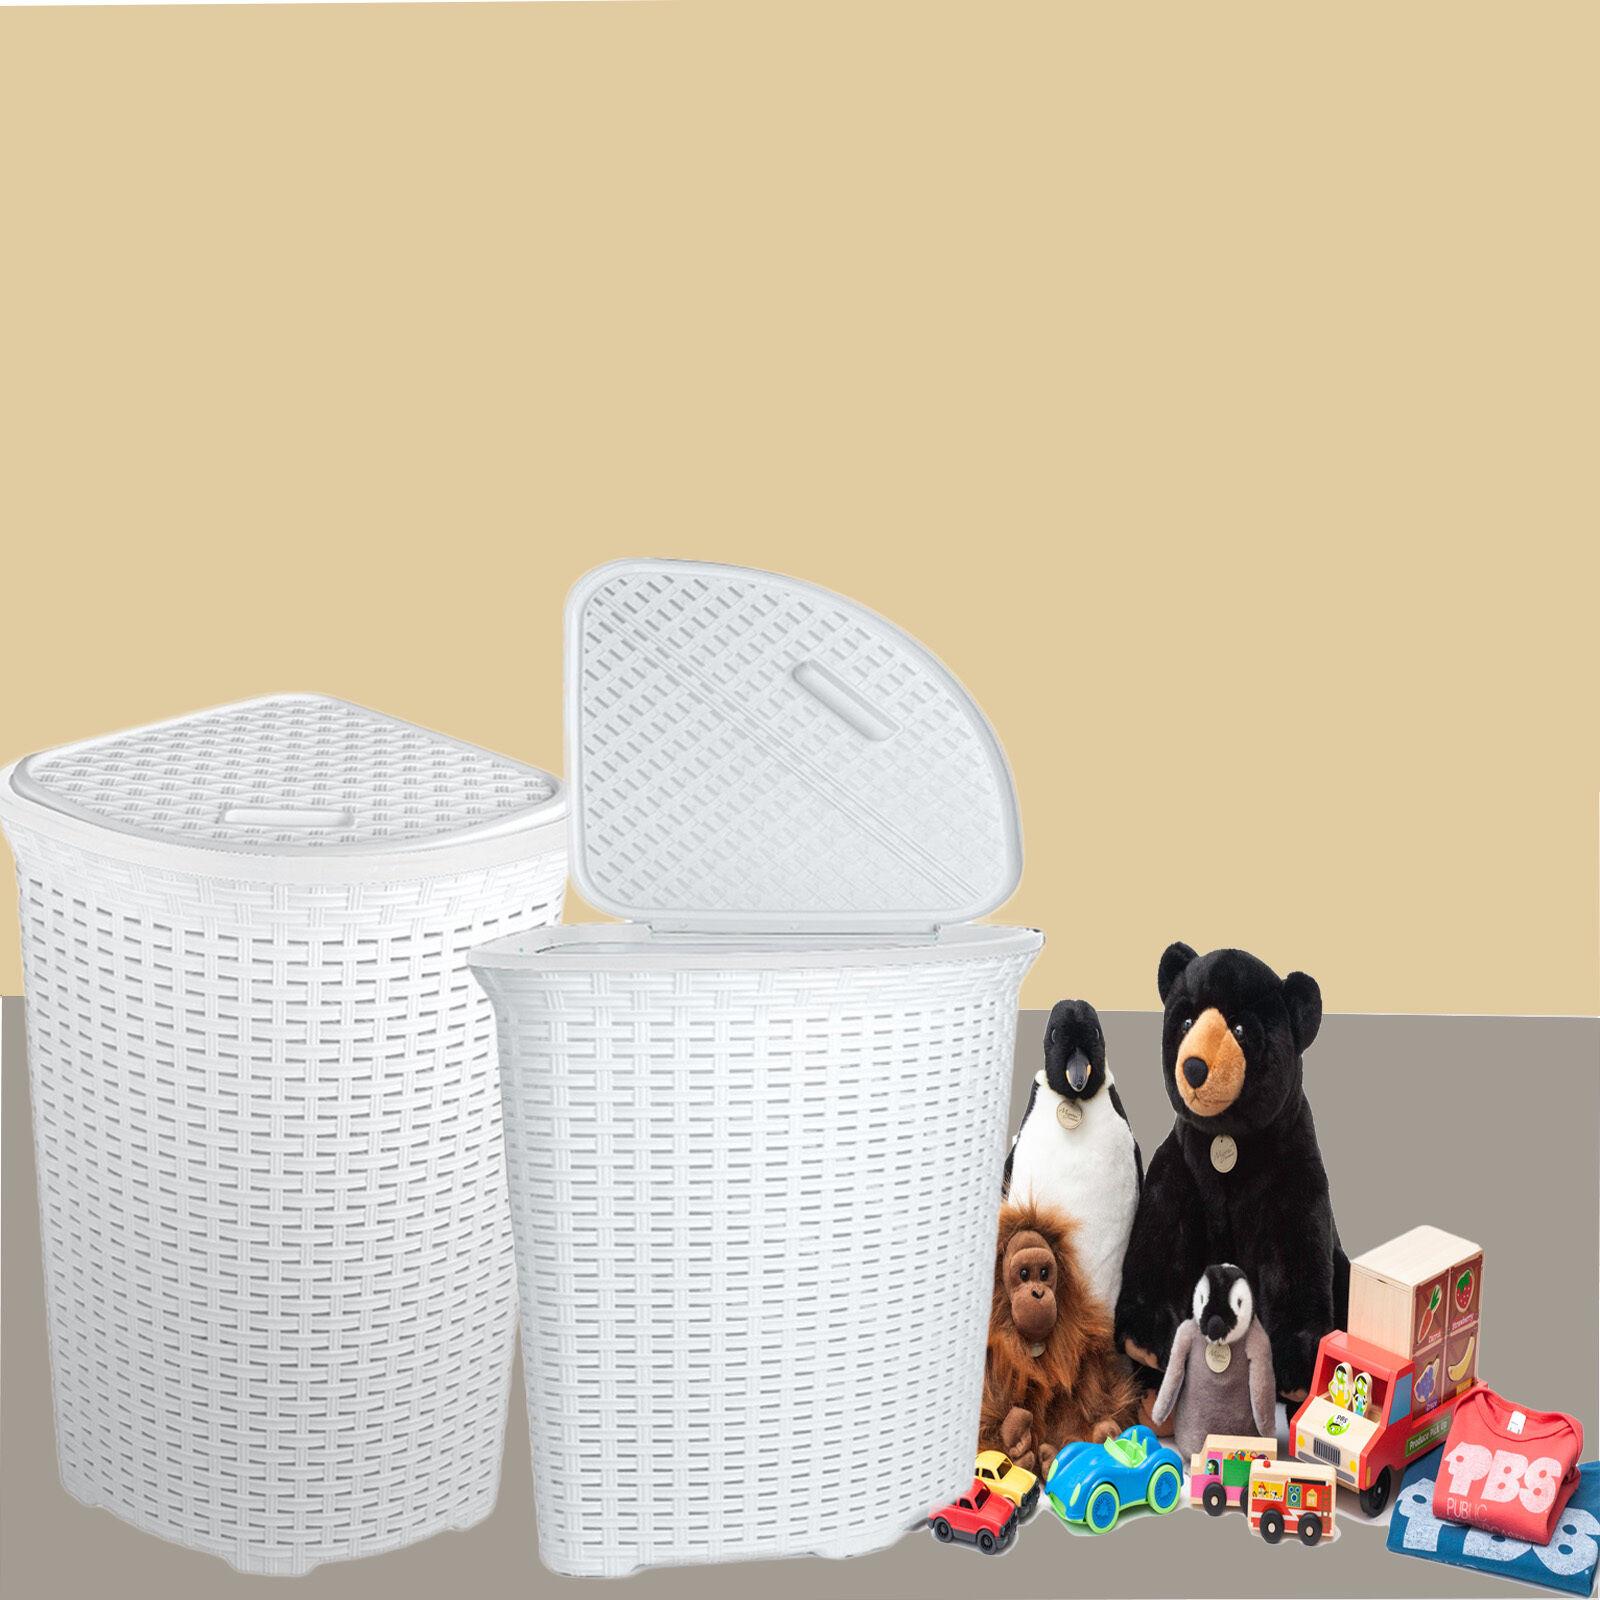 Large Corner Rattan Wicker Laundry Basket Cloth Lining W